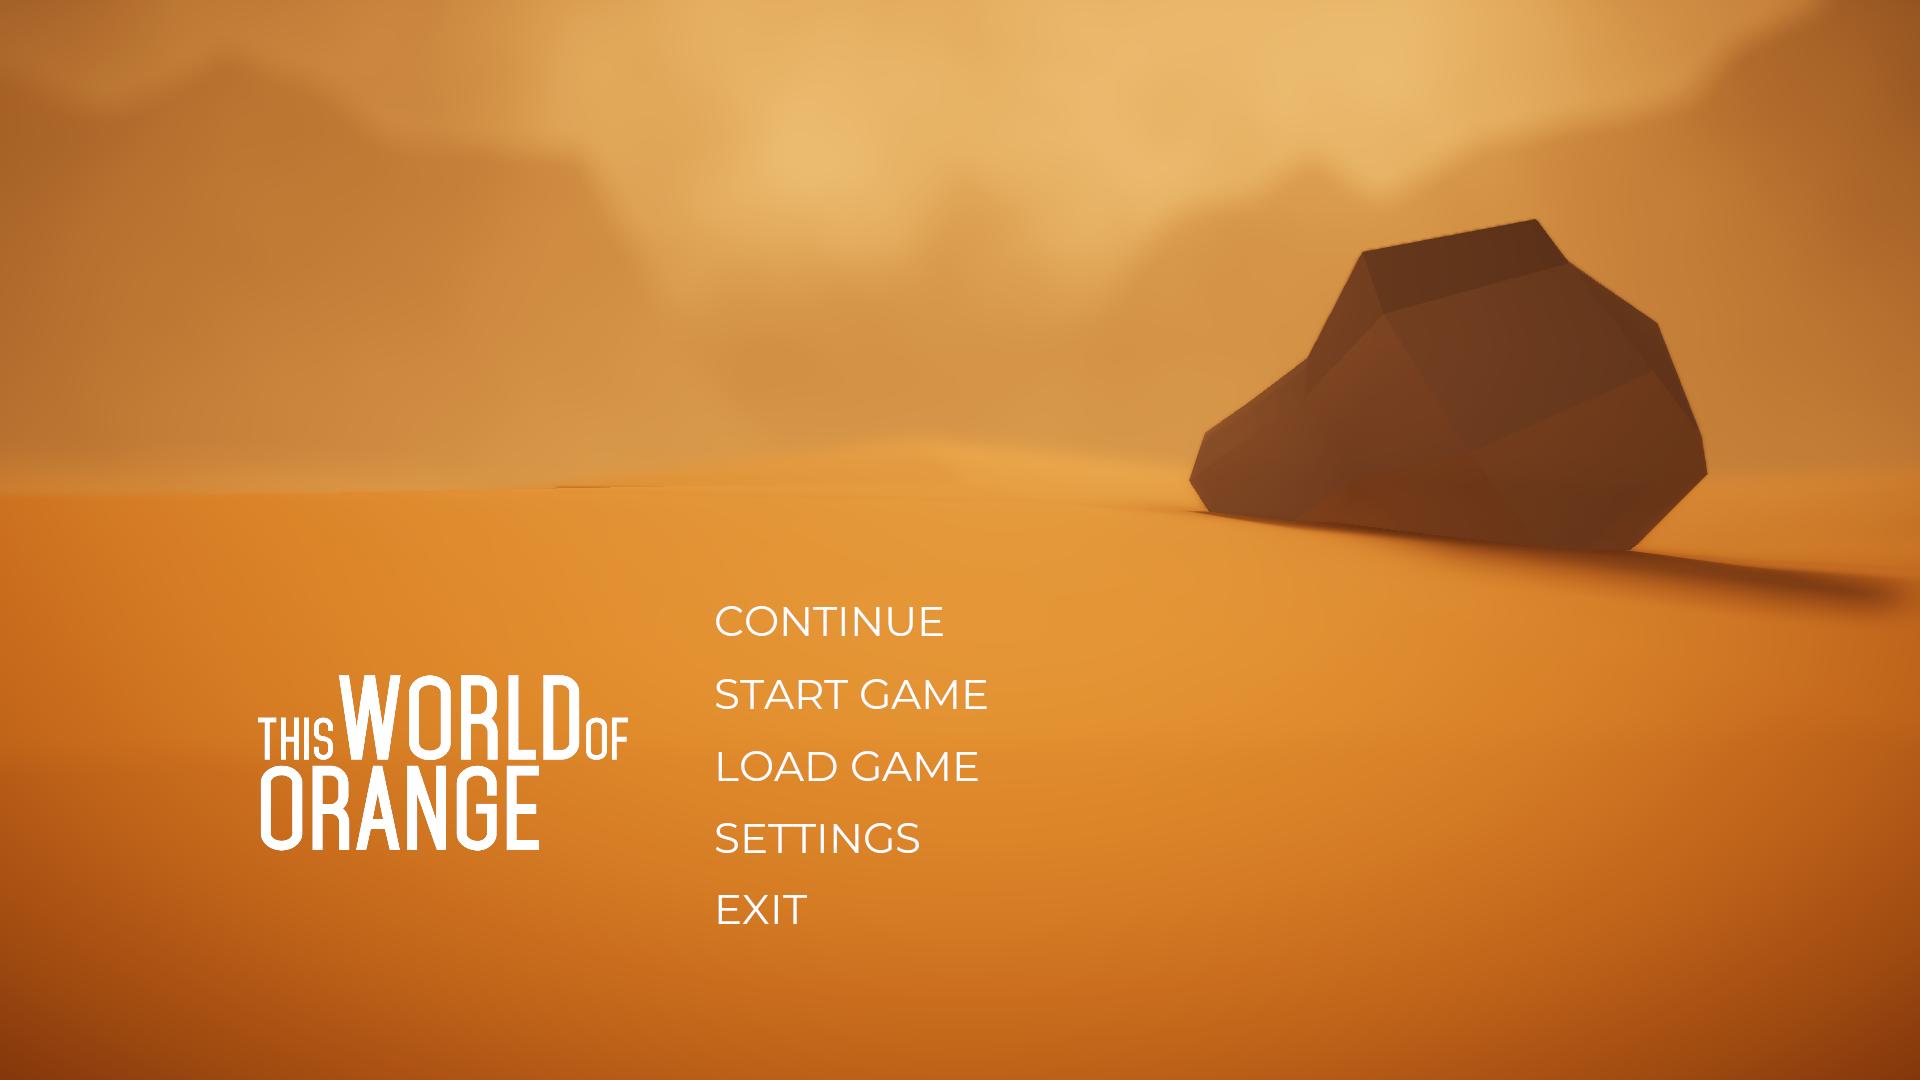 Main Menu Design & Animation | This World of Orange